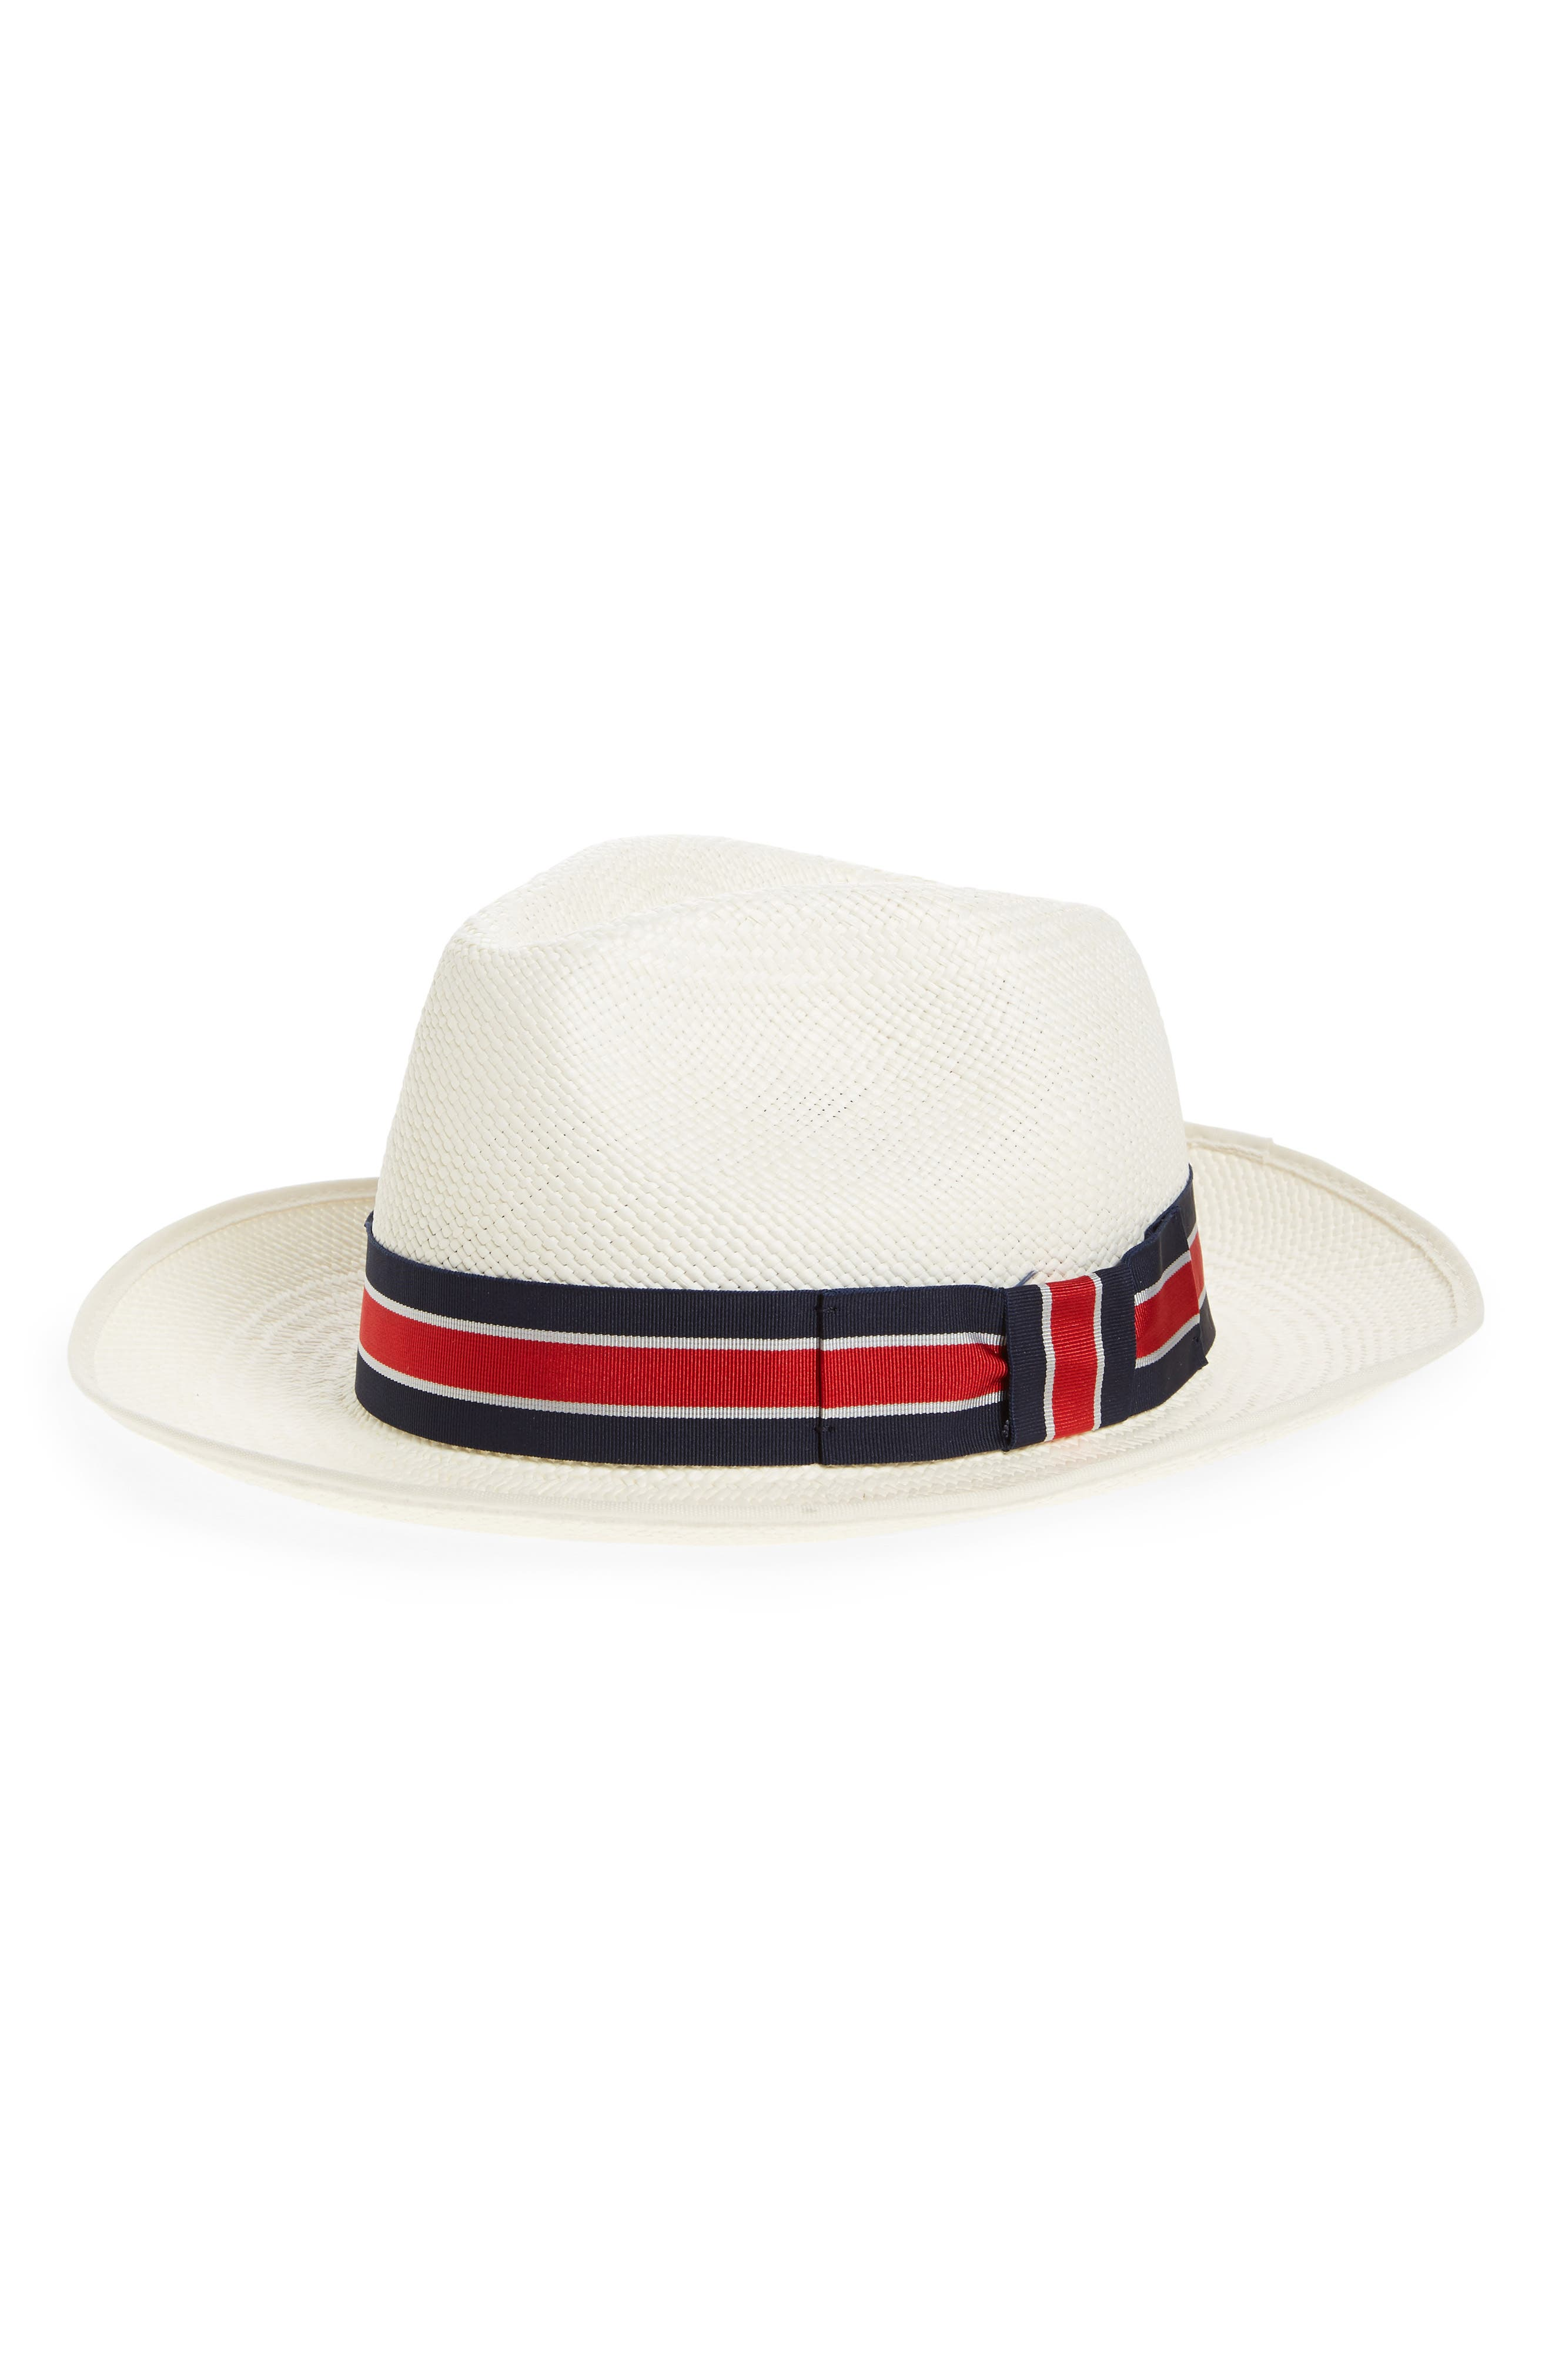 Christy's Preset Panama Hat,                             Main thumbnail 1, color,                             250